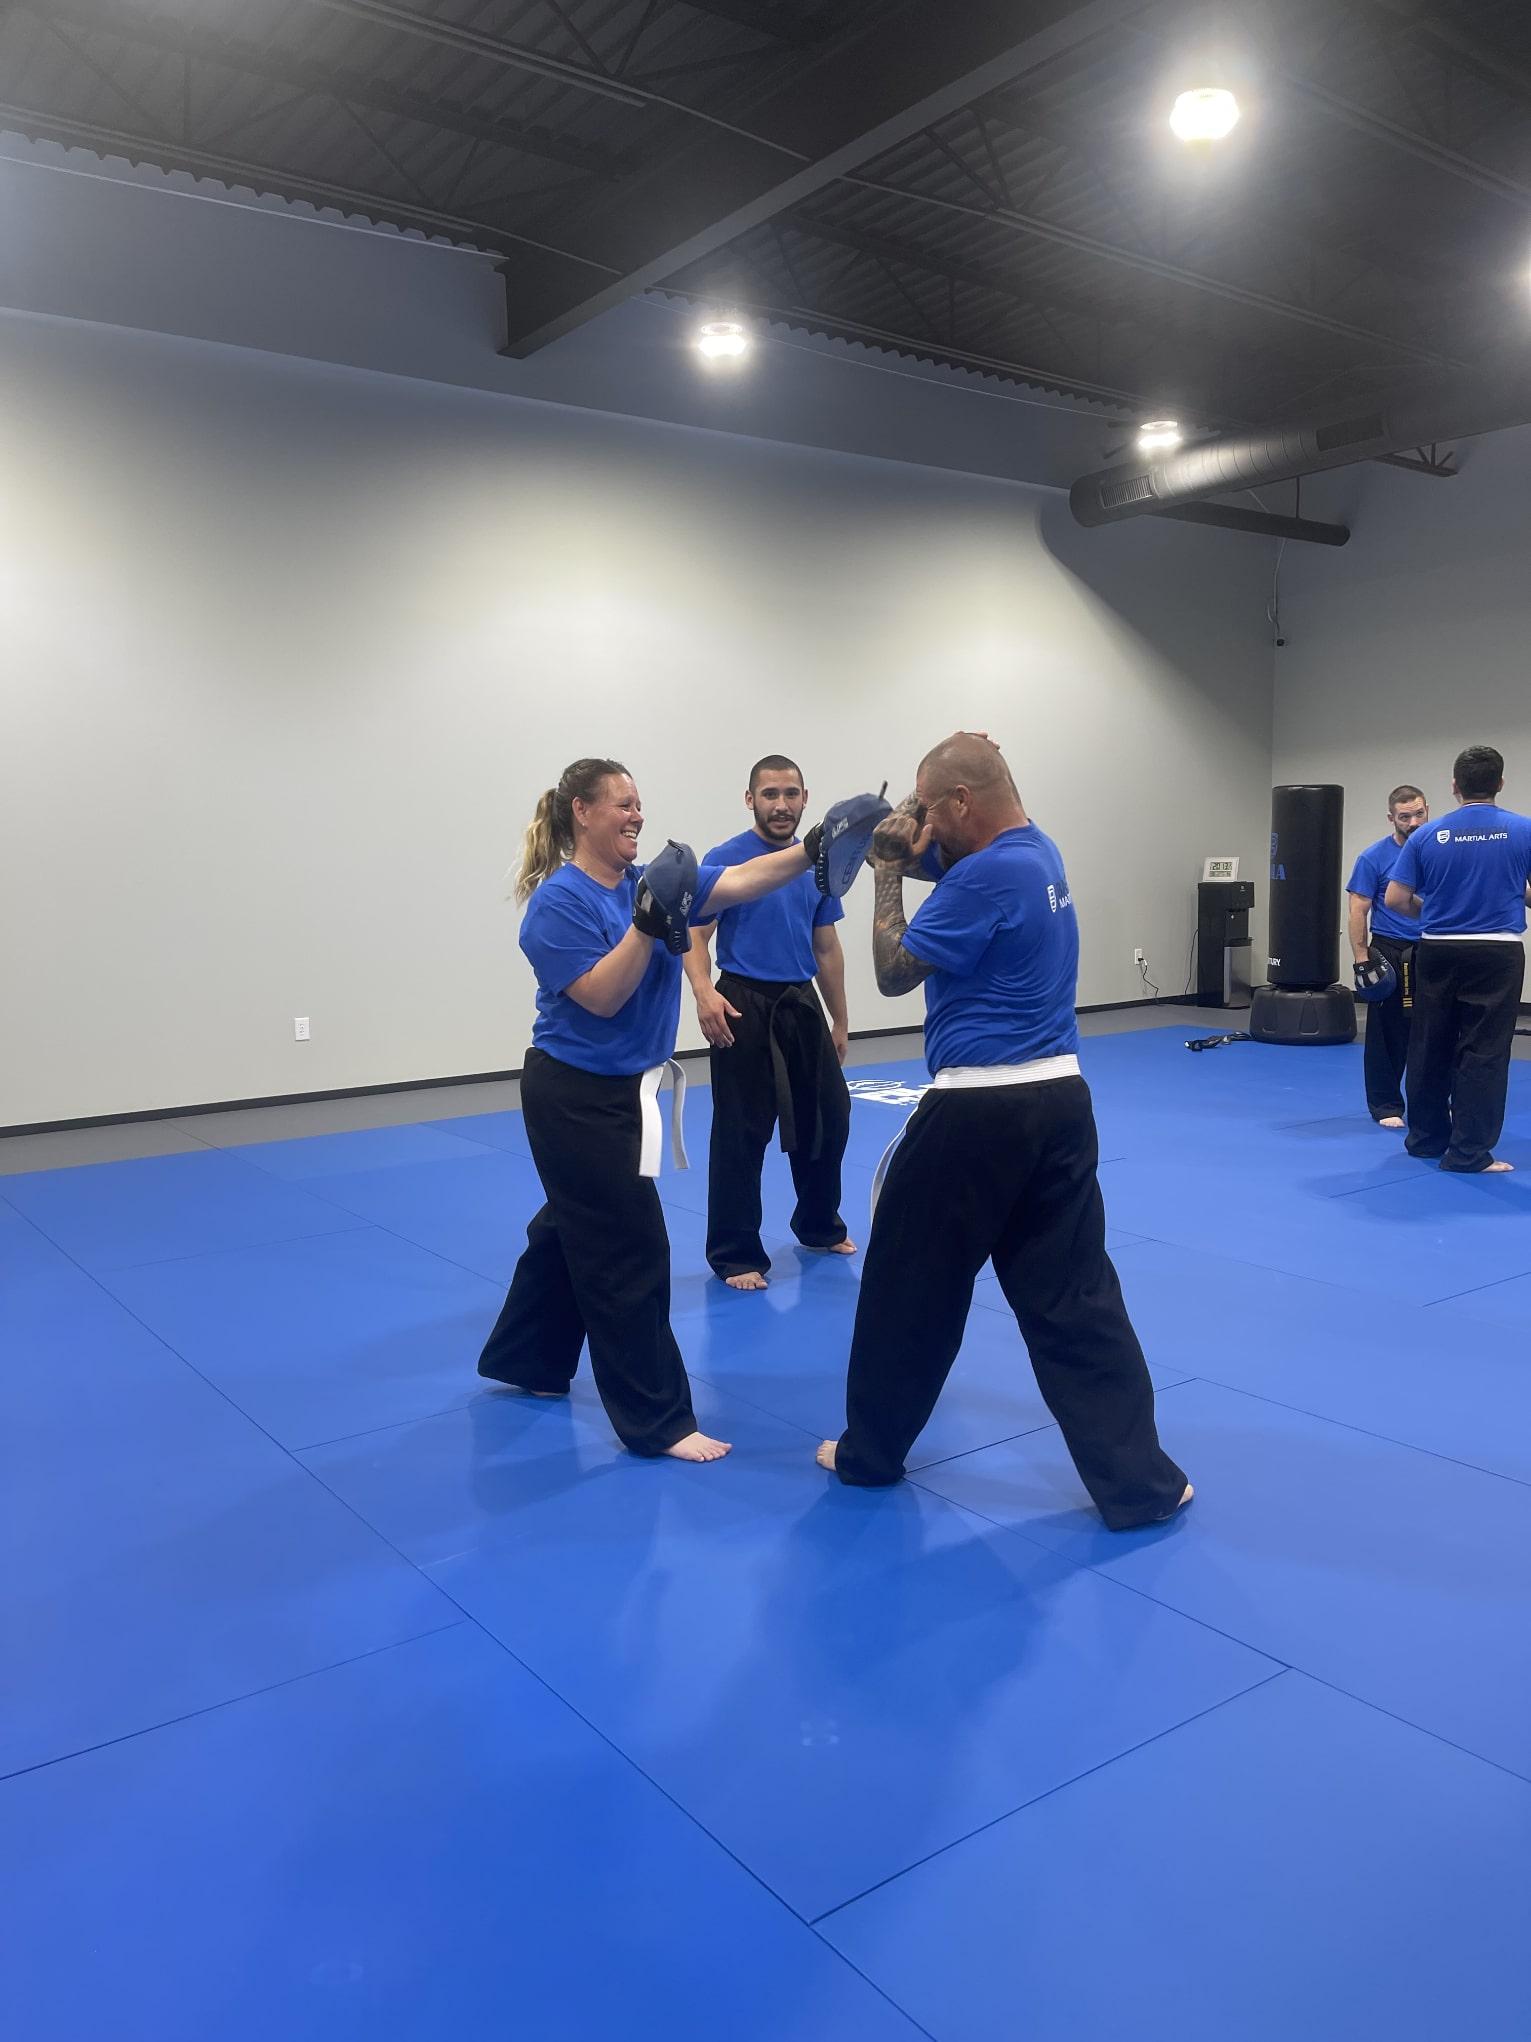 Bastion Martial Arts Programs